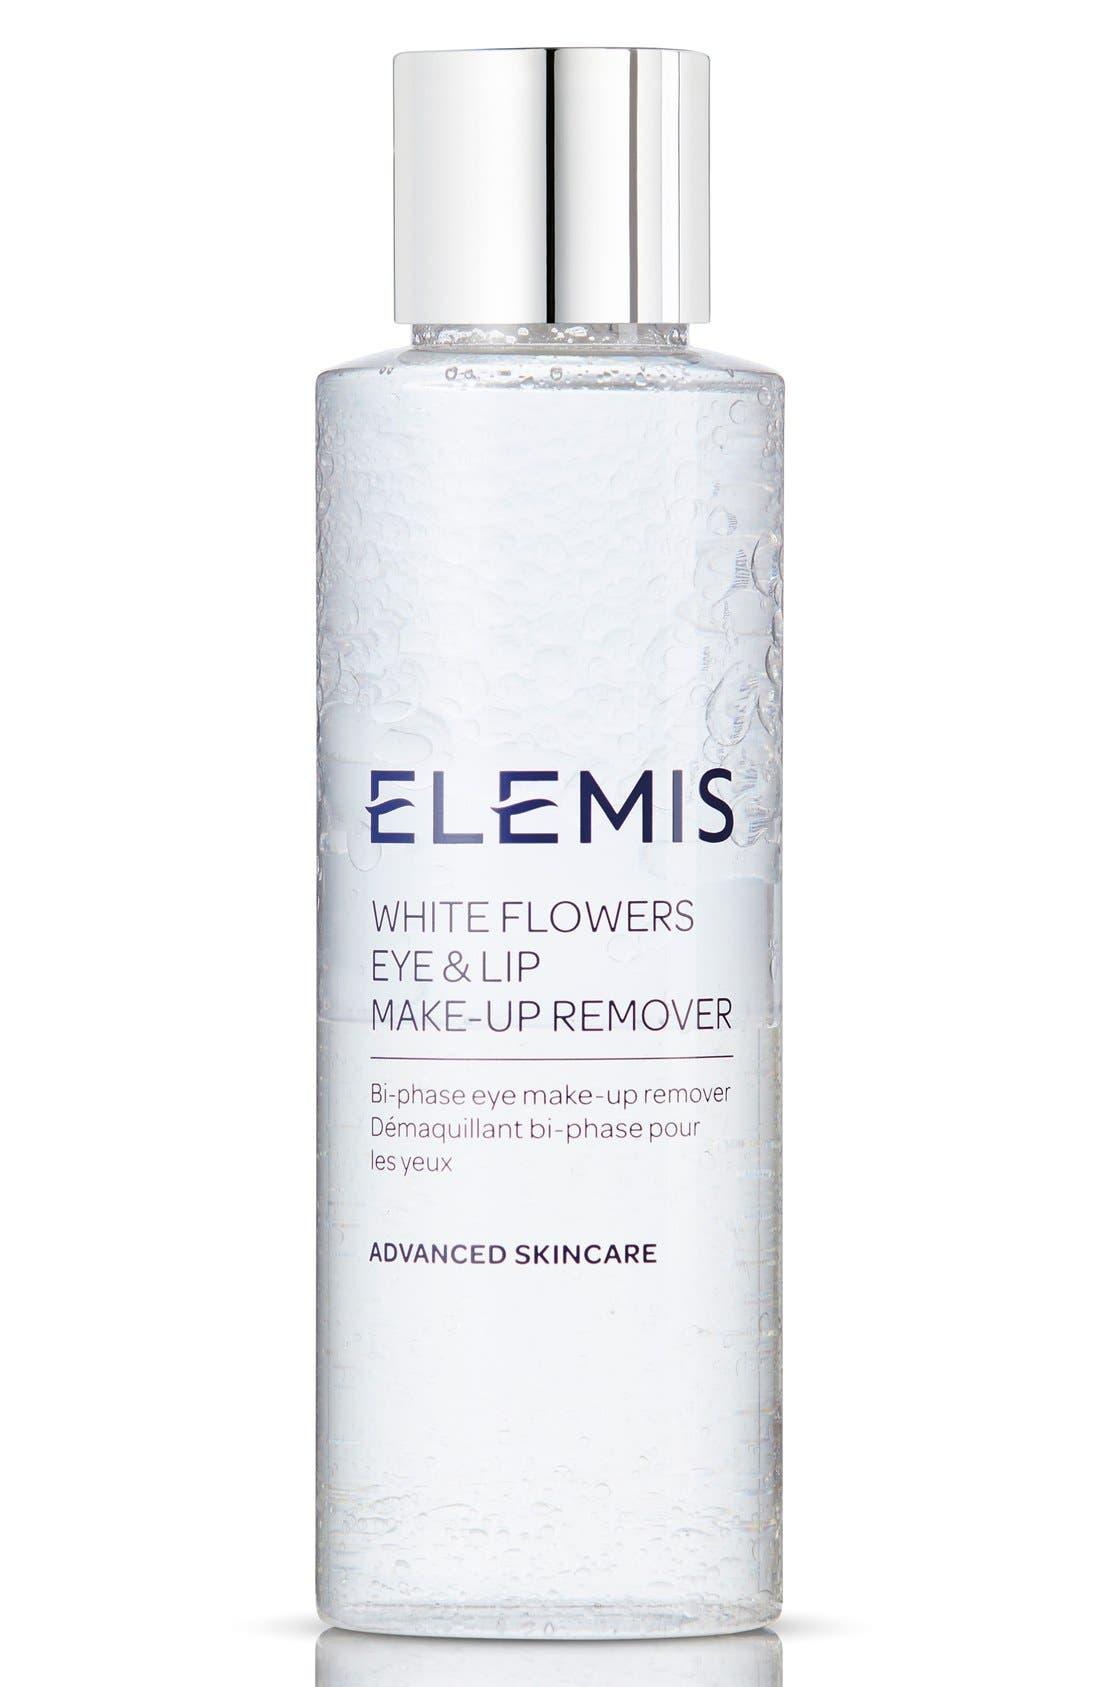 Elemis 'White Flowers' Eye & Lip Makeup Remover